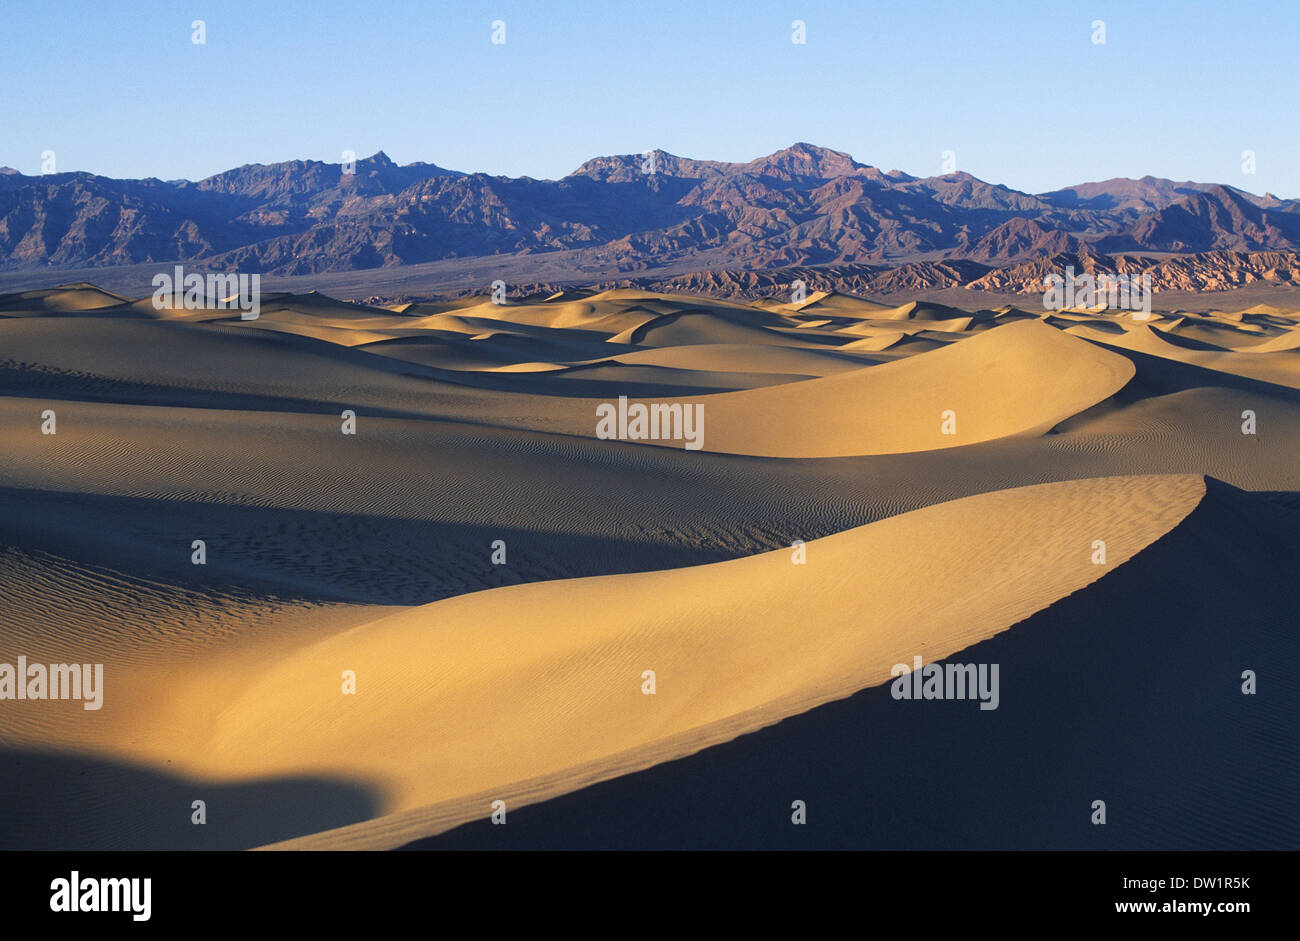 Elk248-2175 Californie, Death Valley National Park, Stovepipe Wells, dunes de sable Banque D'Images